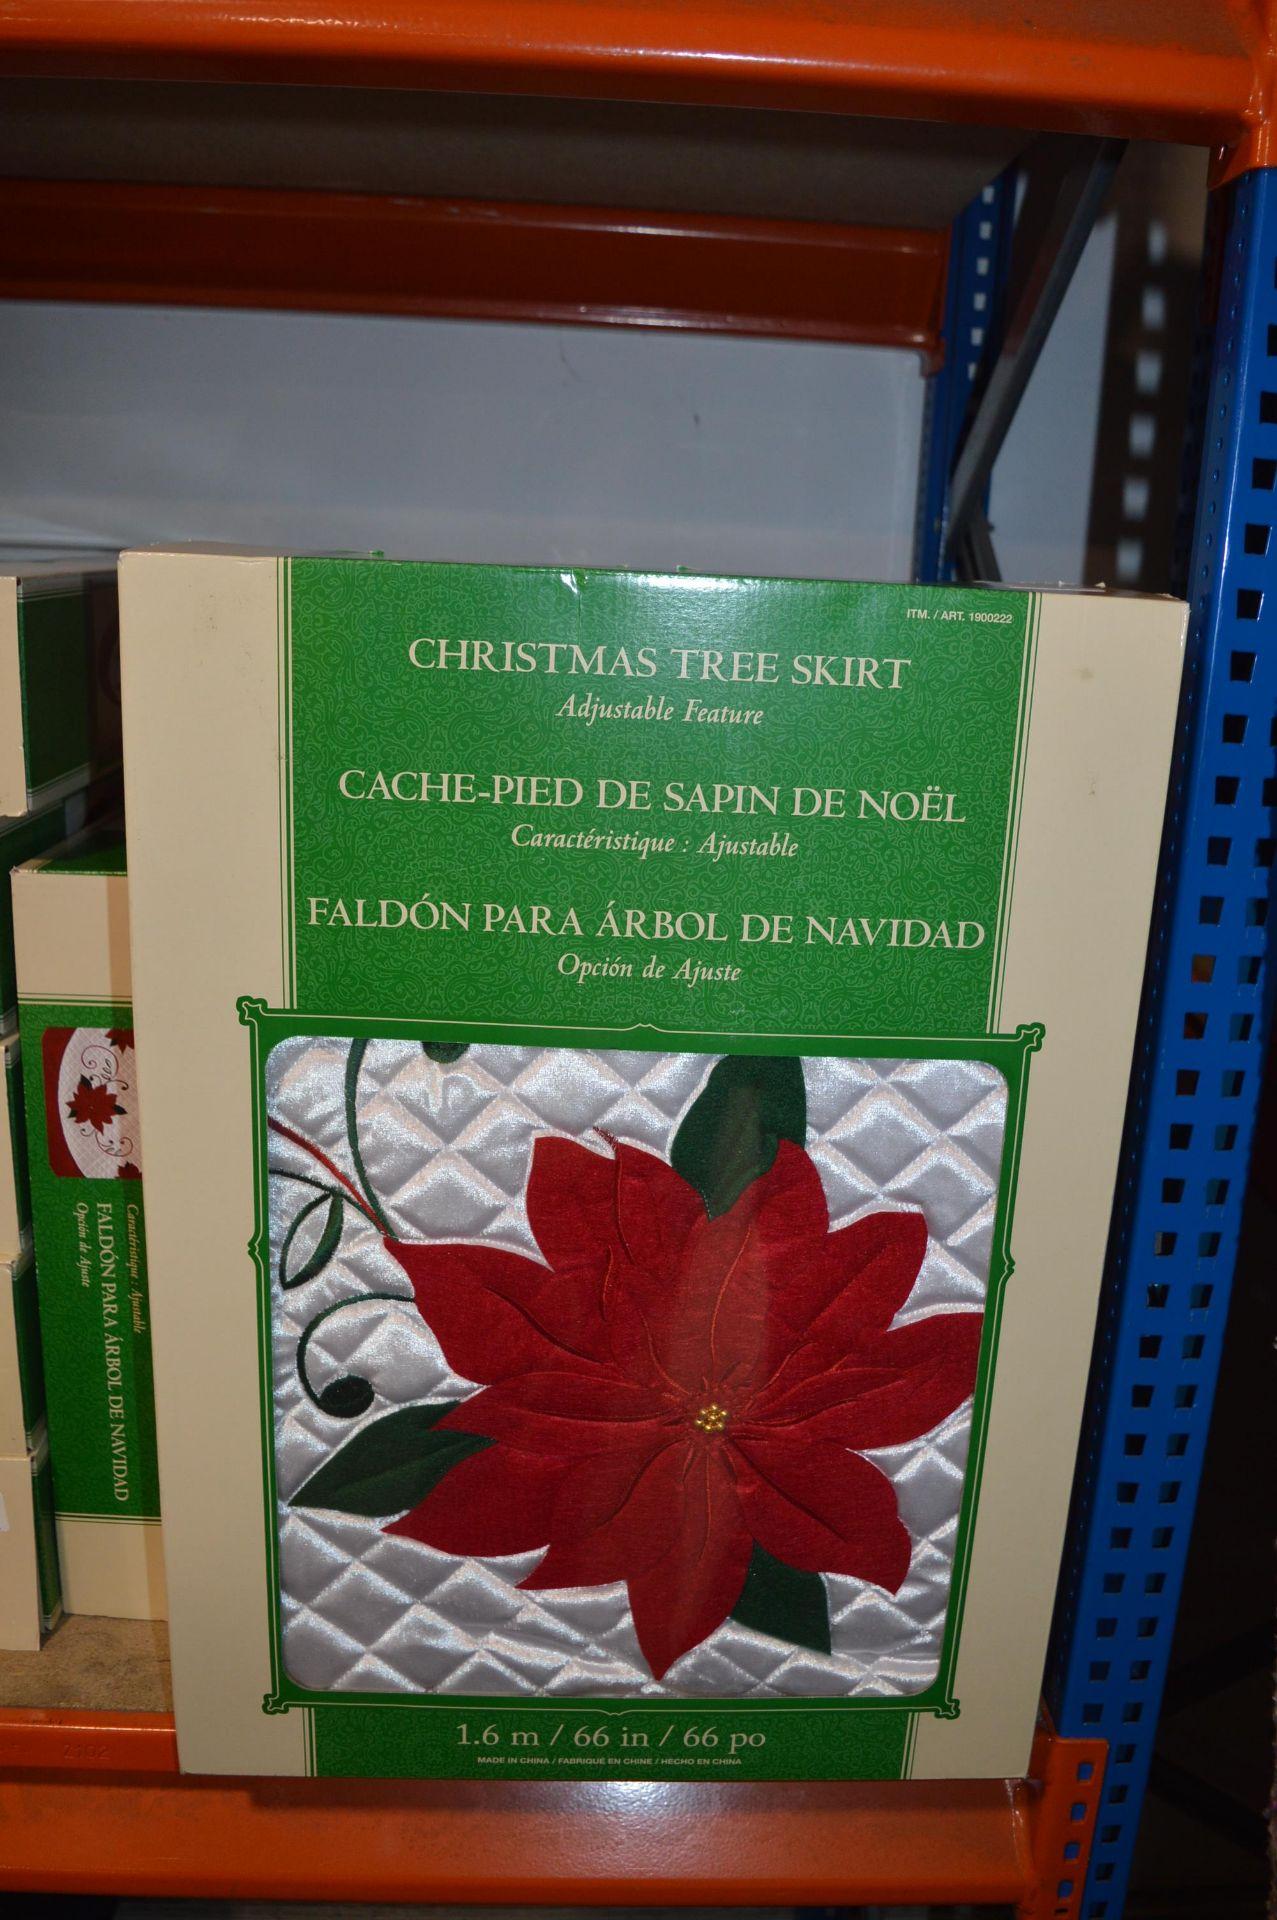 Lot 20 - *Christmas Tree Skirt 1.6m